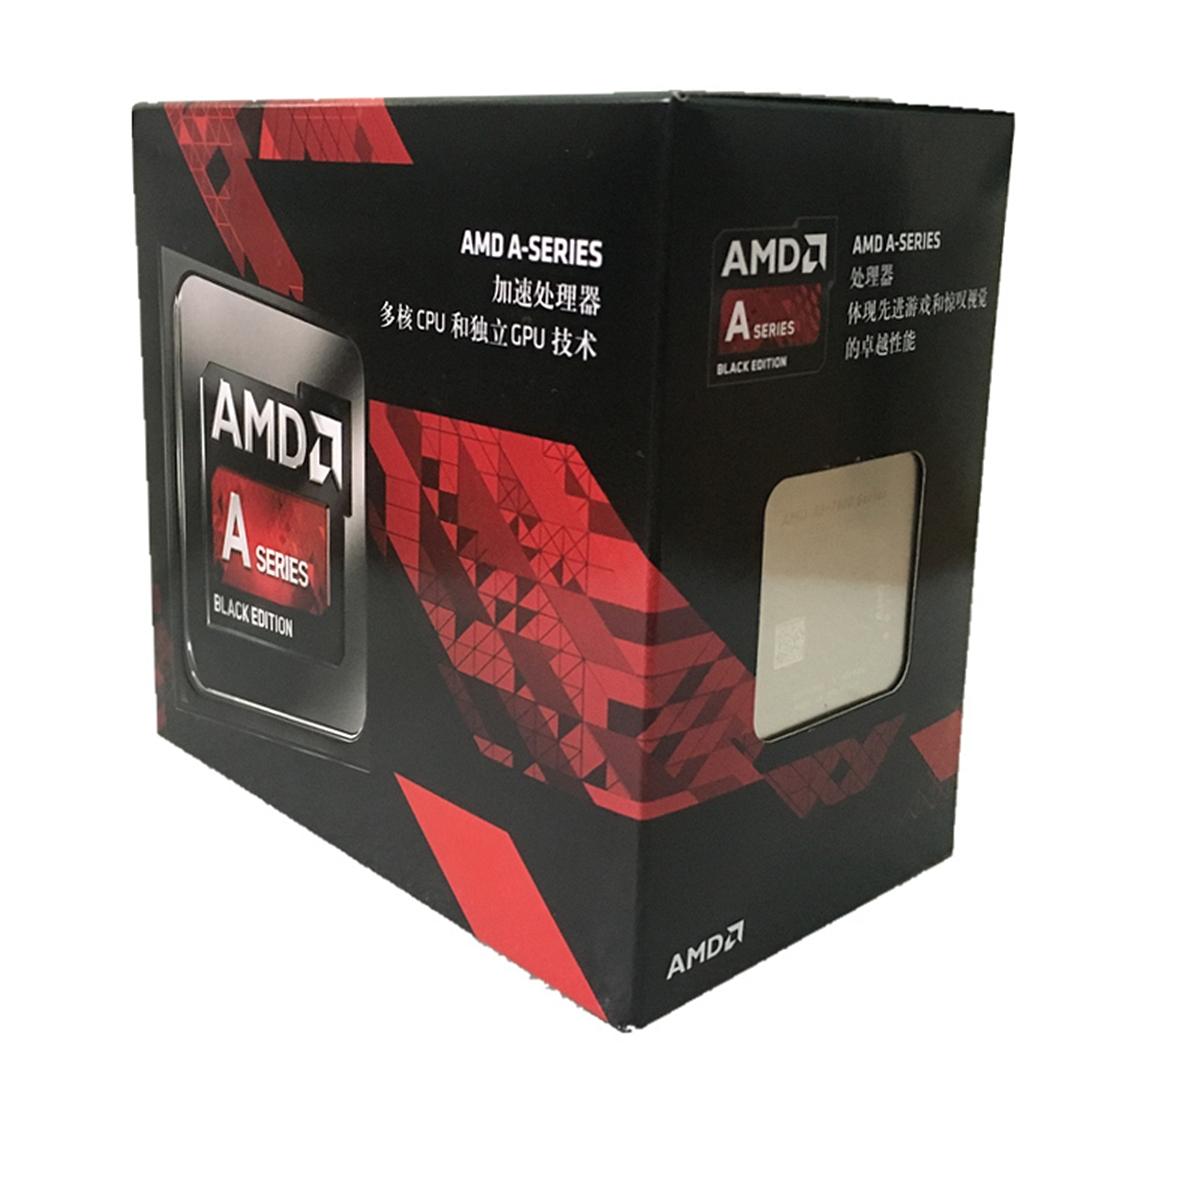 AMD A8 7650k盒装 CPU 3.3GHz/3.8GHz (单位:个) 银色